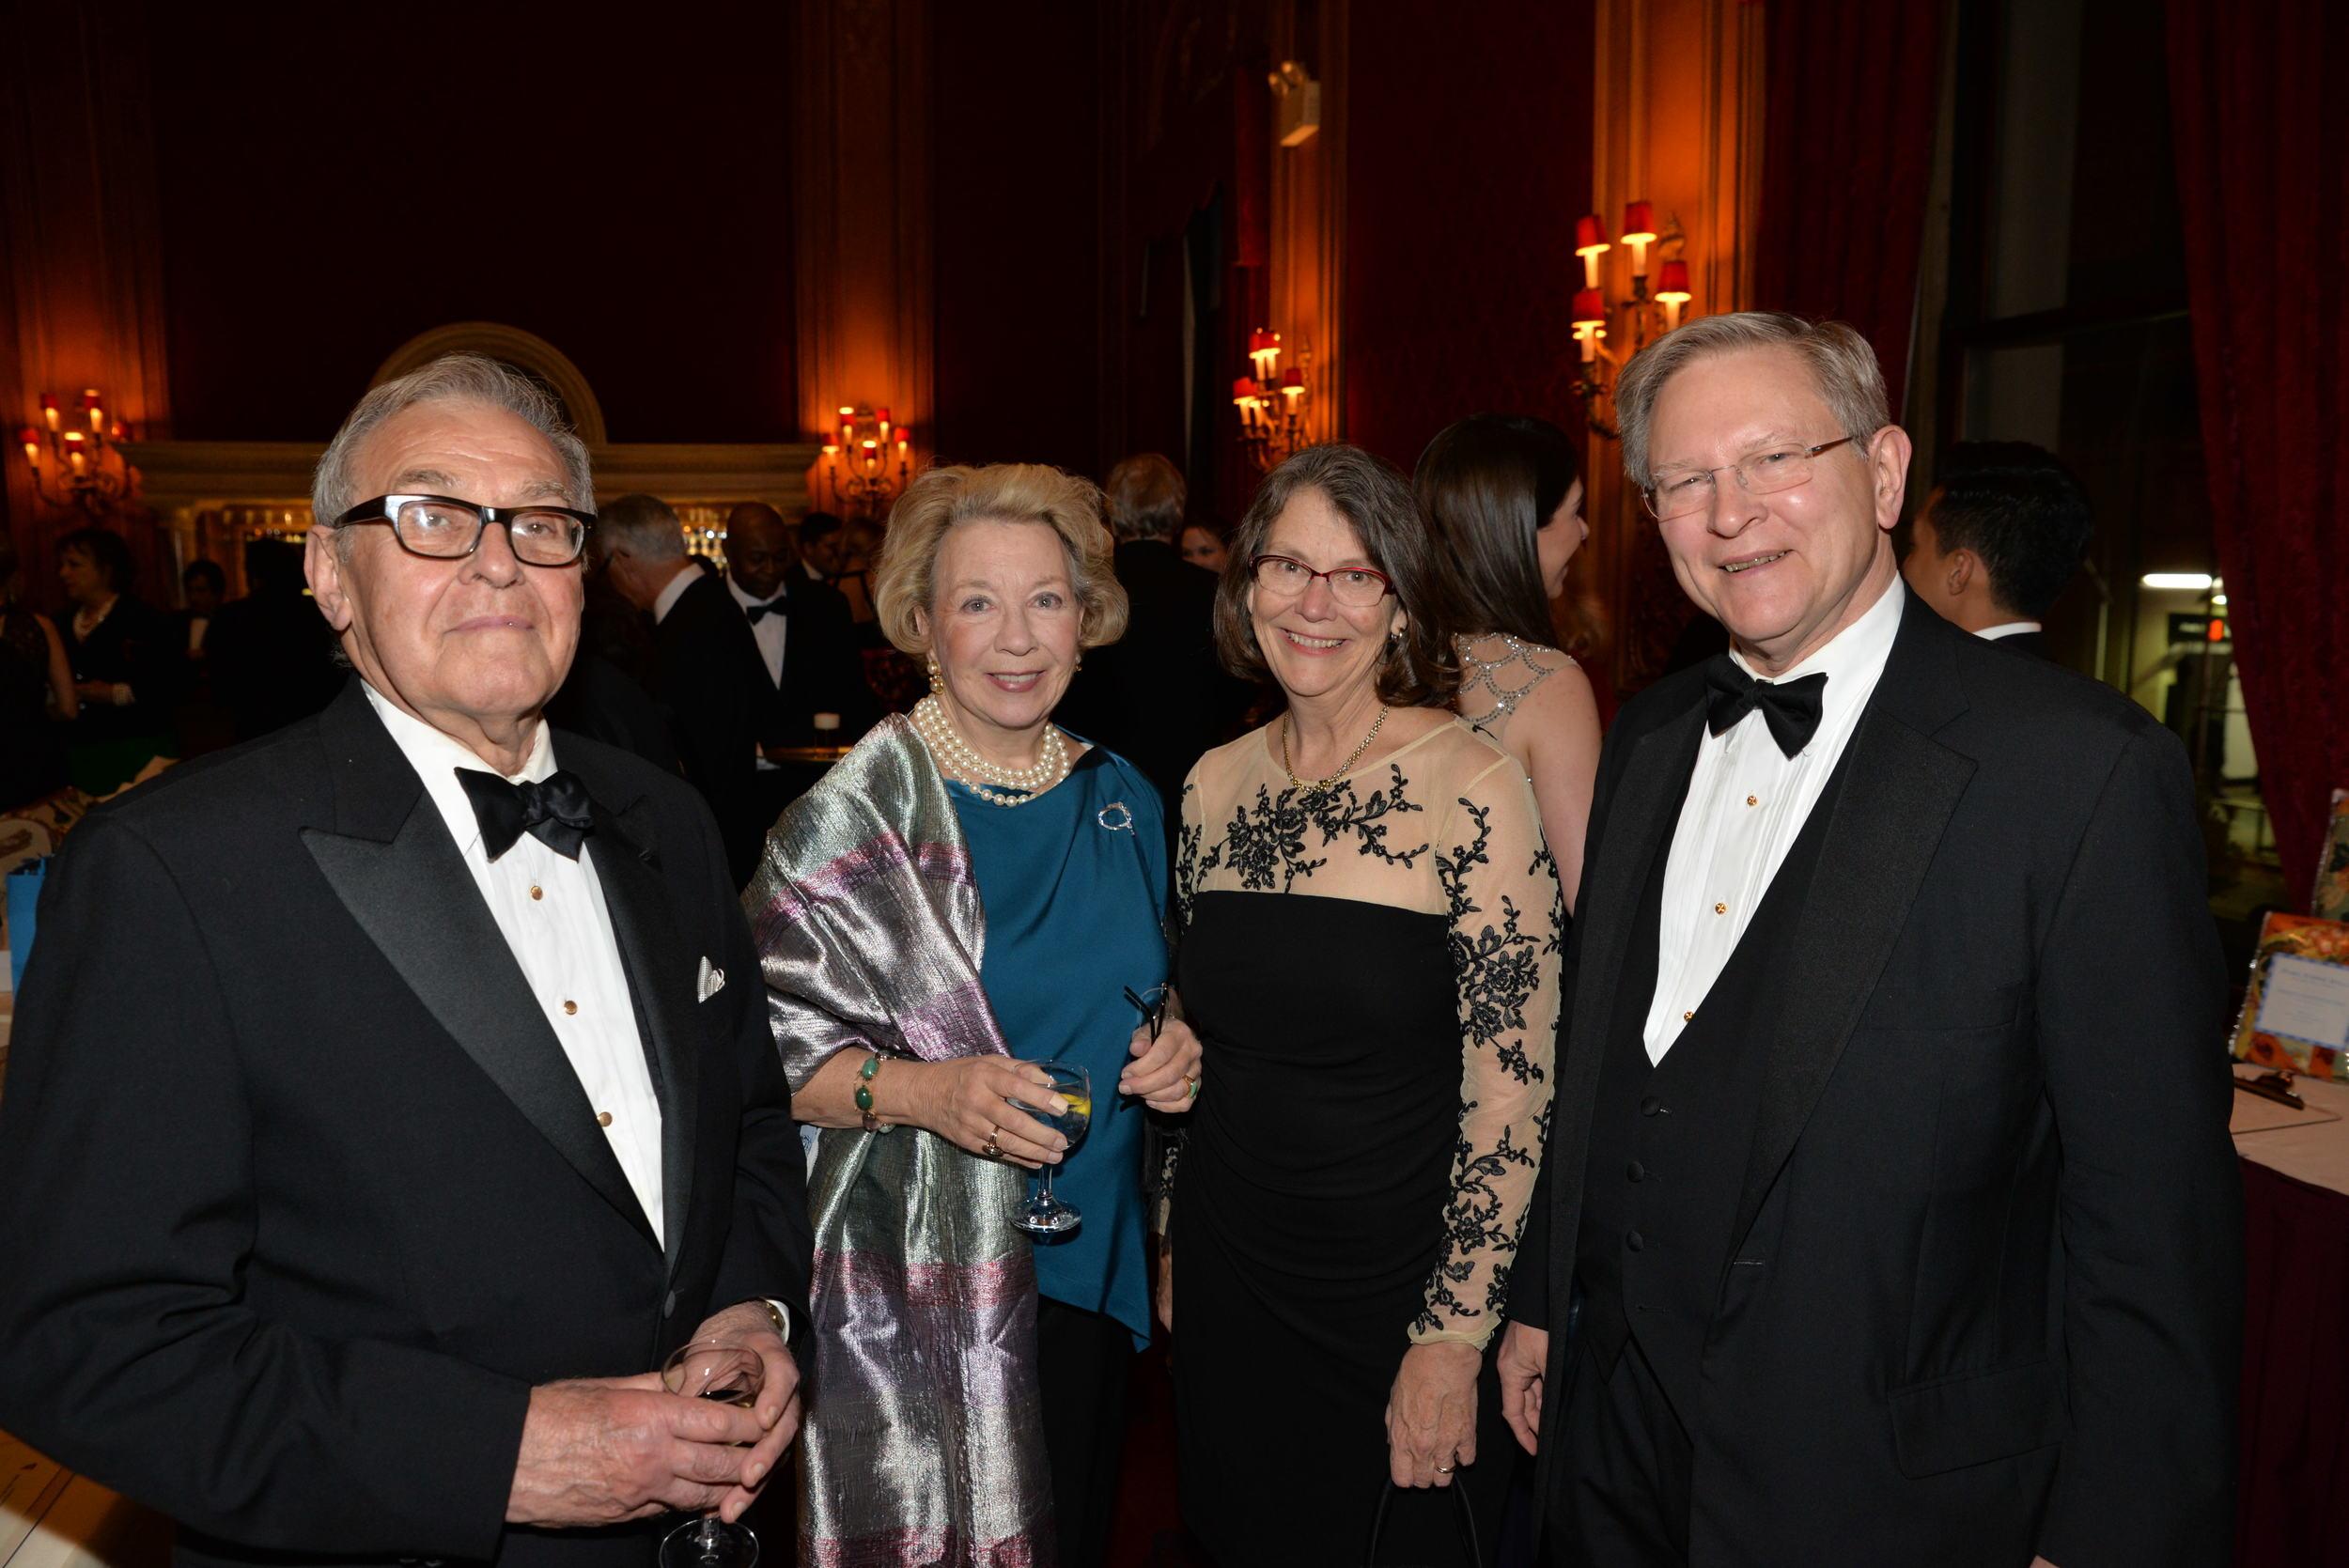 DSC_3595-Laszlo Meszoly, Pauline C. Metcalf, Susan Morris, Robert Morris.JPG